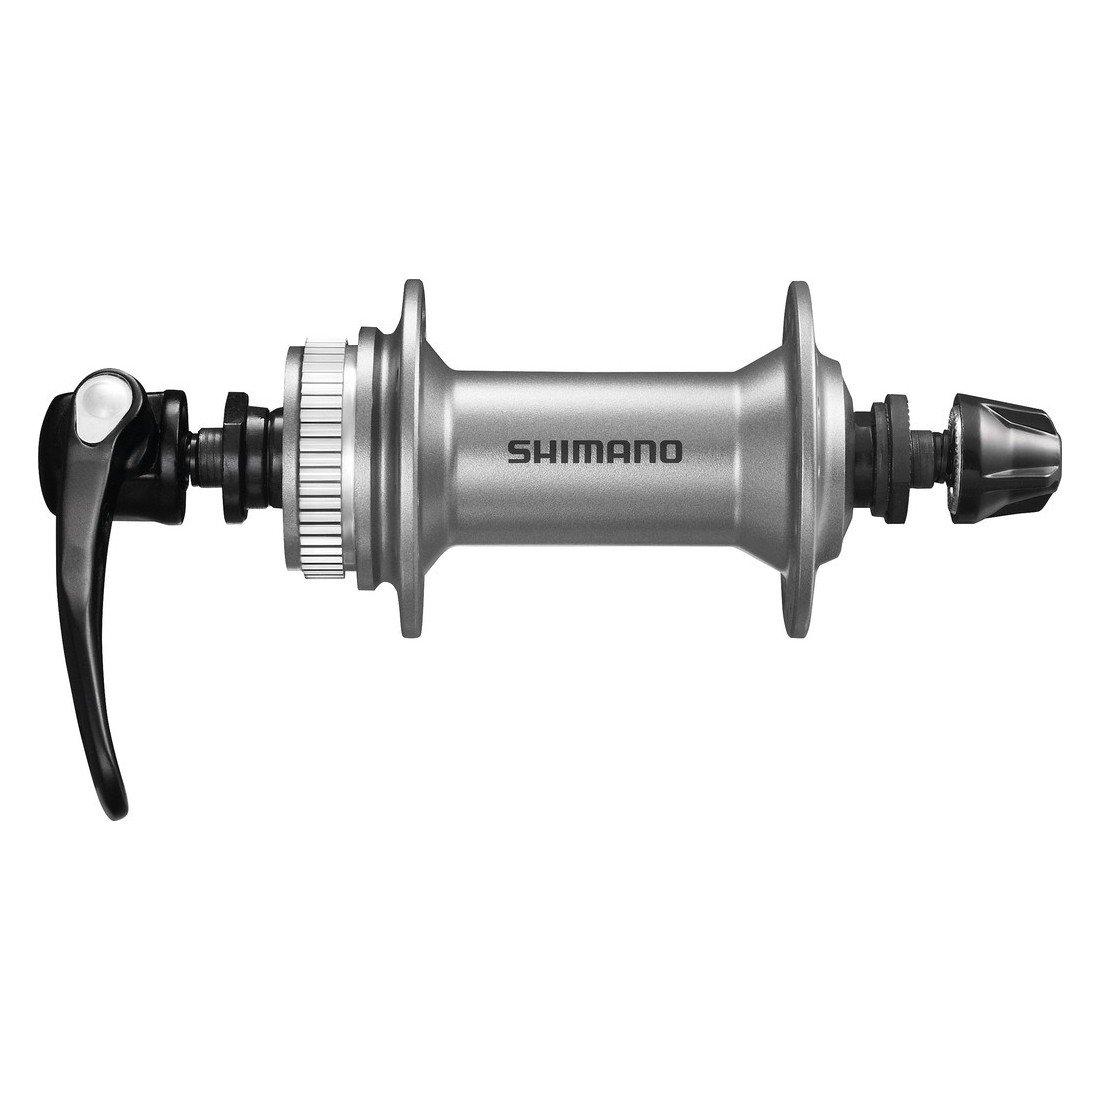 Shimano Alivio HR-Nabe FH-M4050 Disc Center Lock // 8/9/10-fach